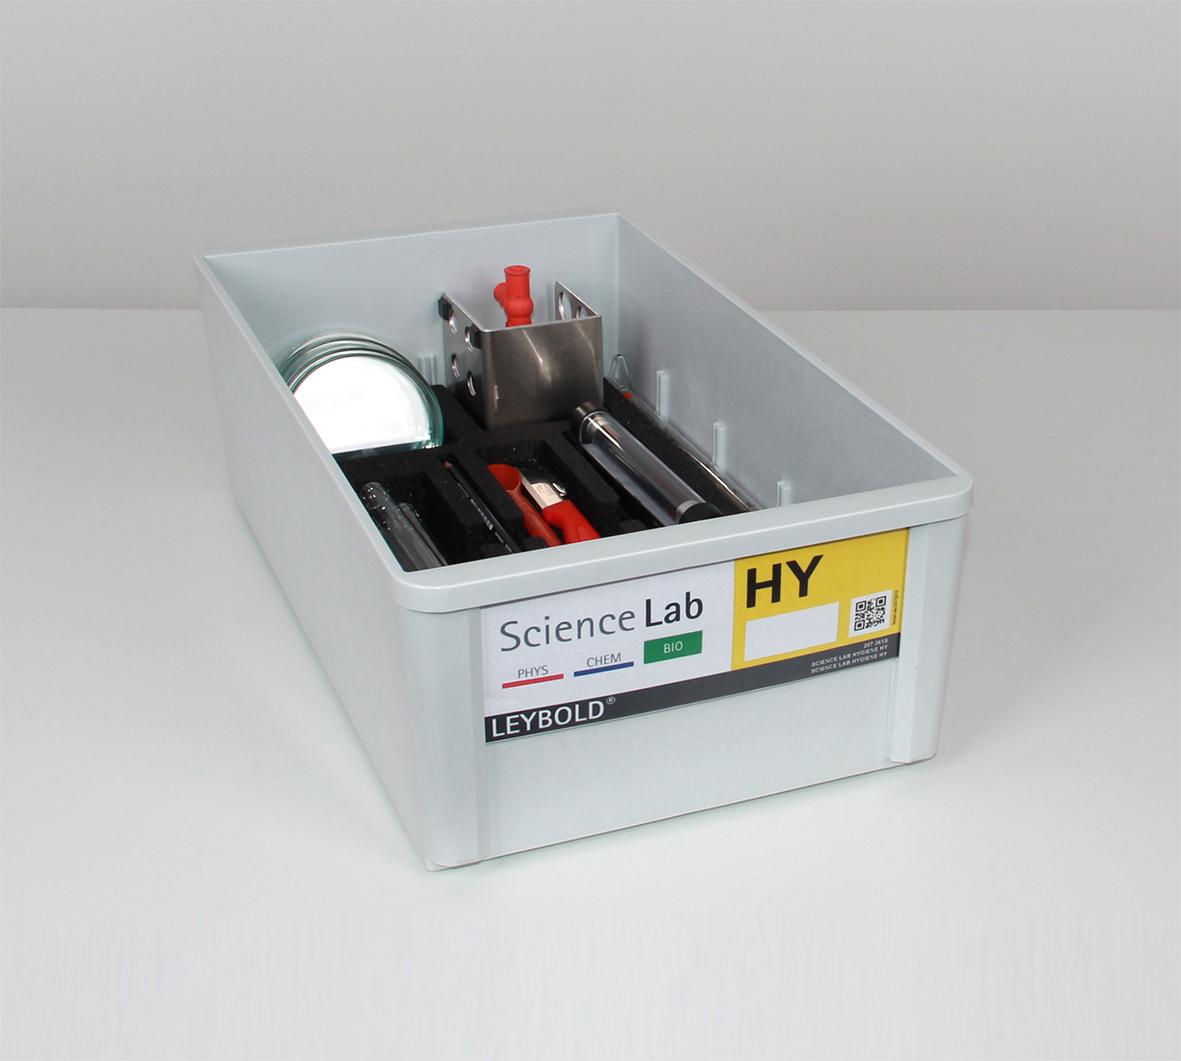 Science Lab Hygiene HY (Set)